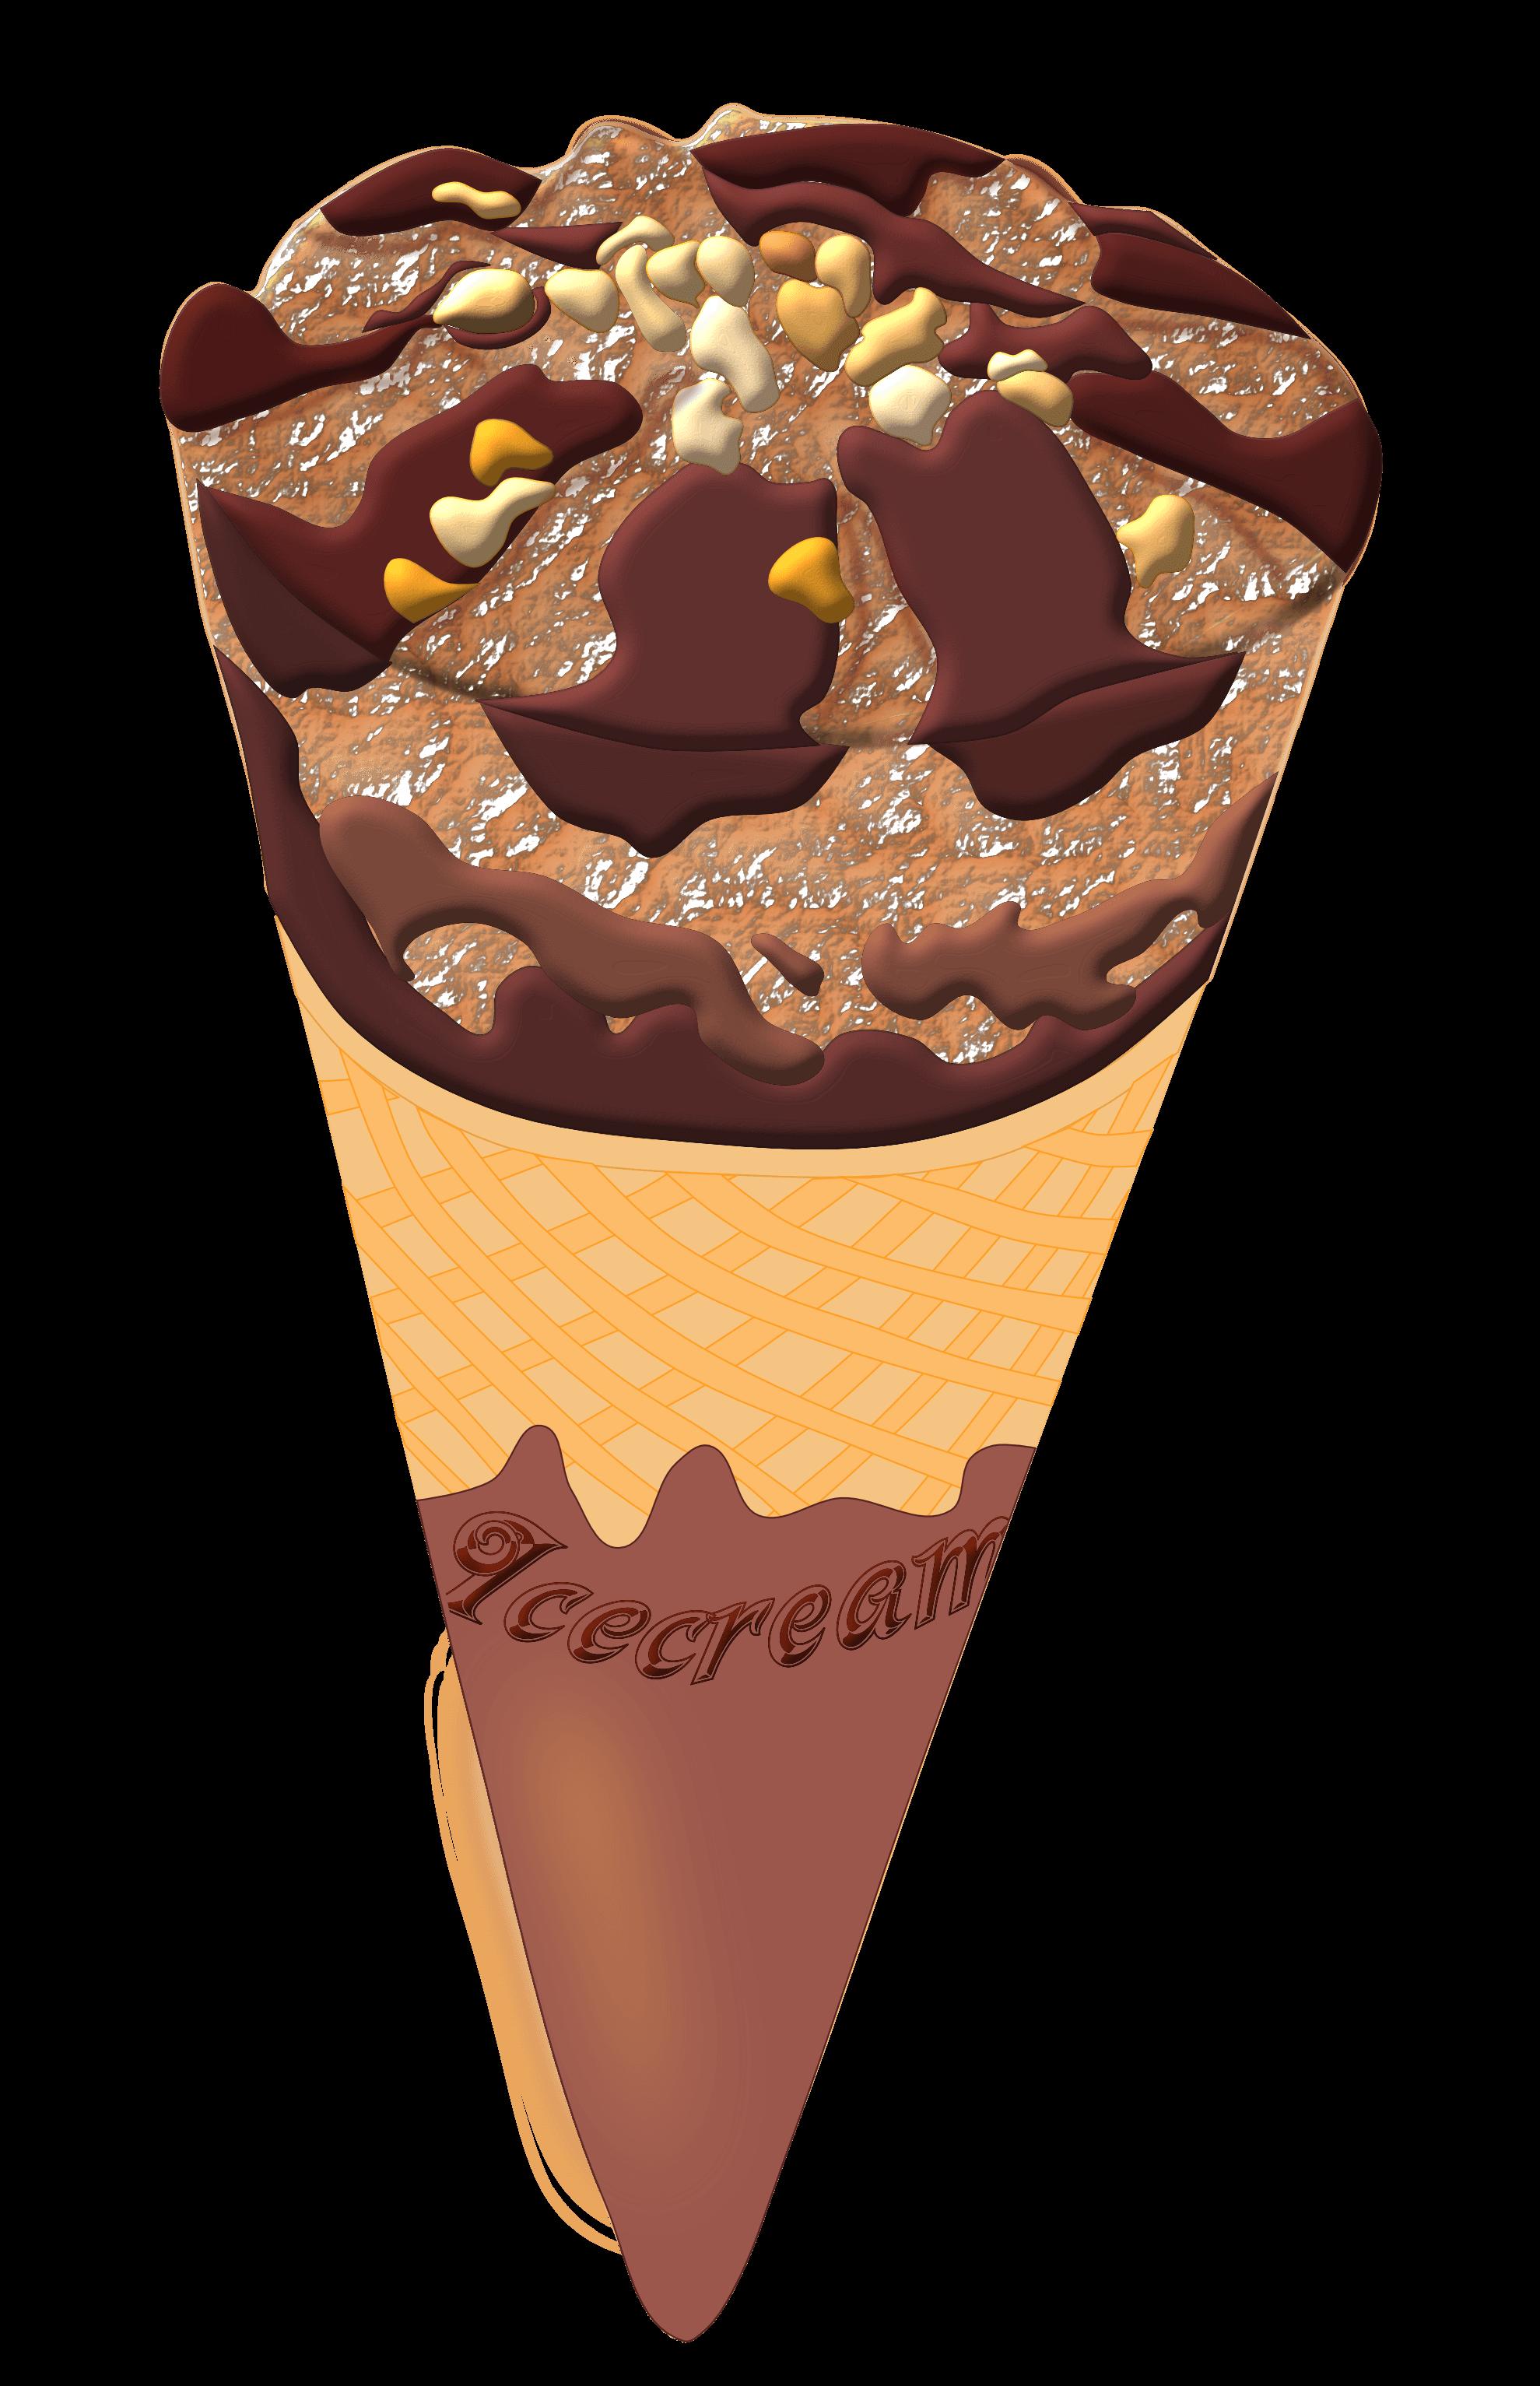 Download Ice Cream Png Image HQ PNG Image | FreePNGImg